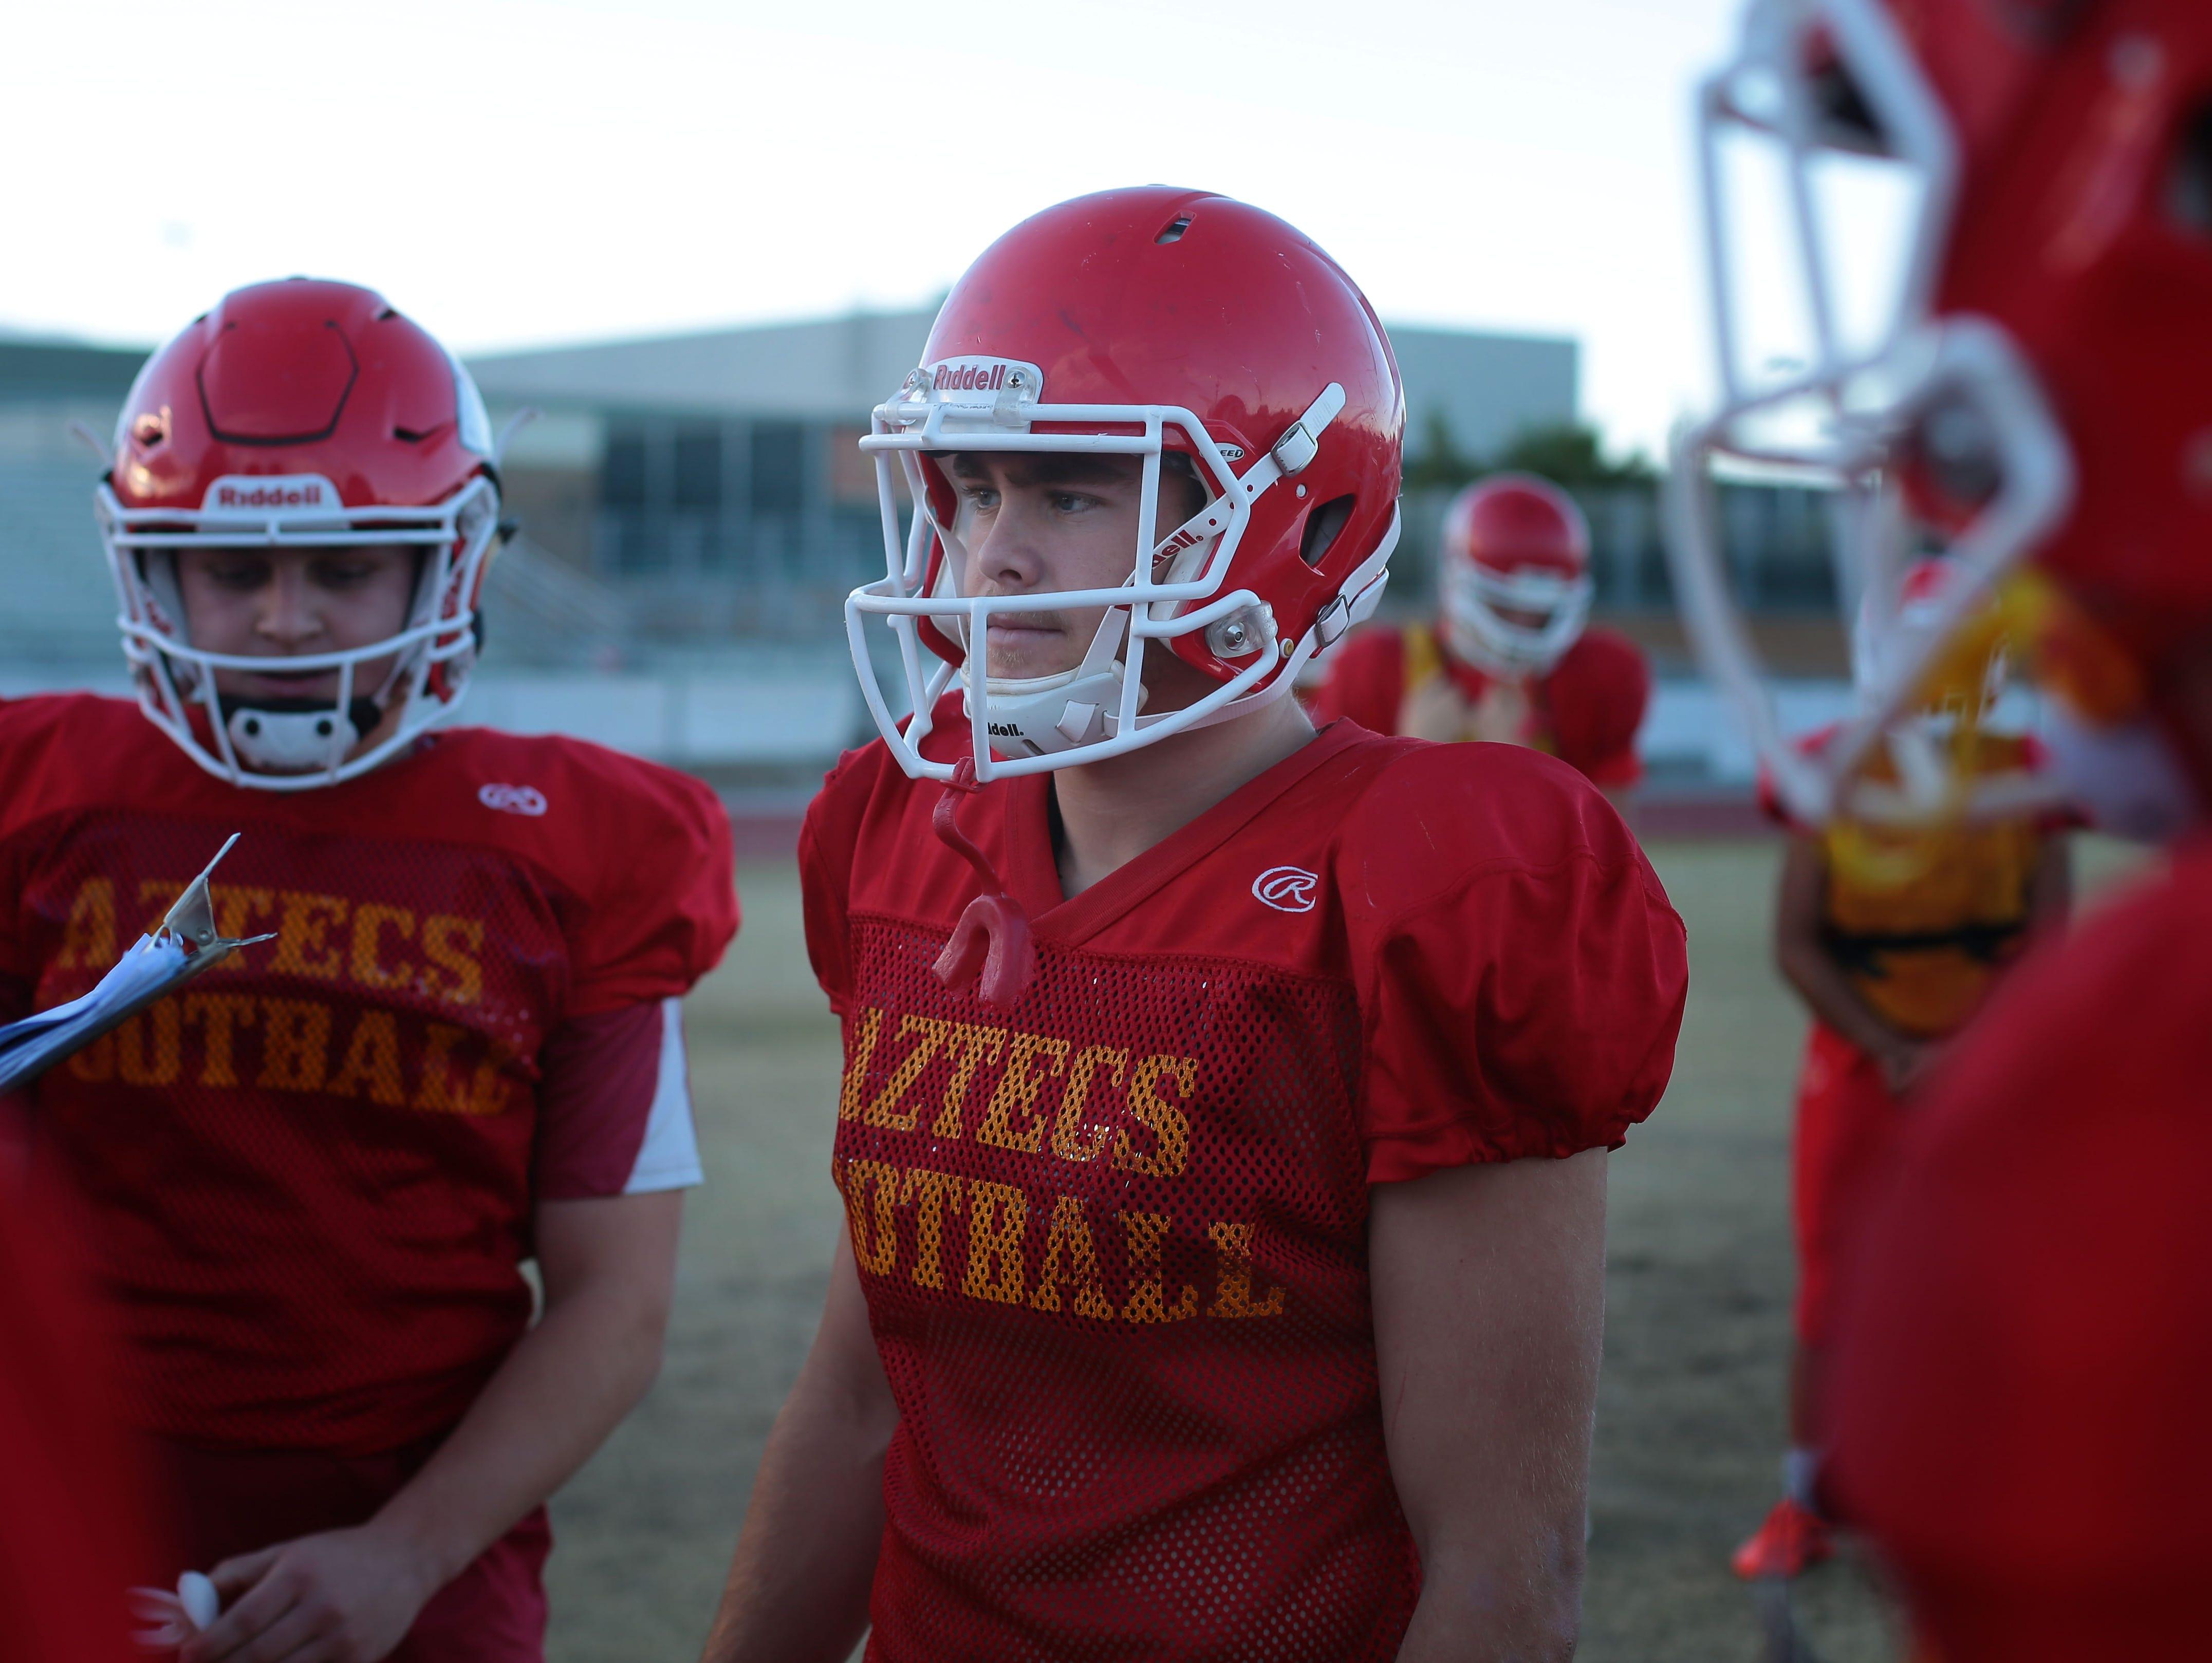 Palm Desert football player Beau Berryhill at practice on Wednesday at Palm Desert High School.